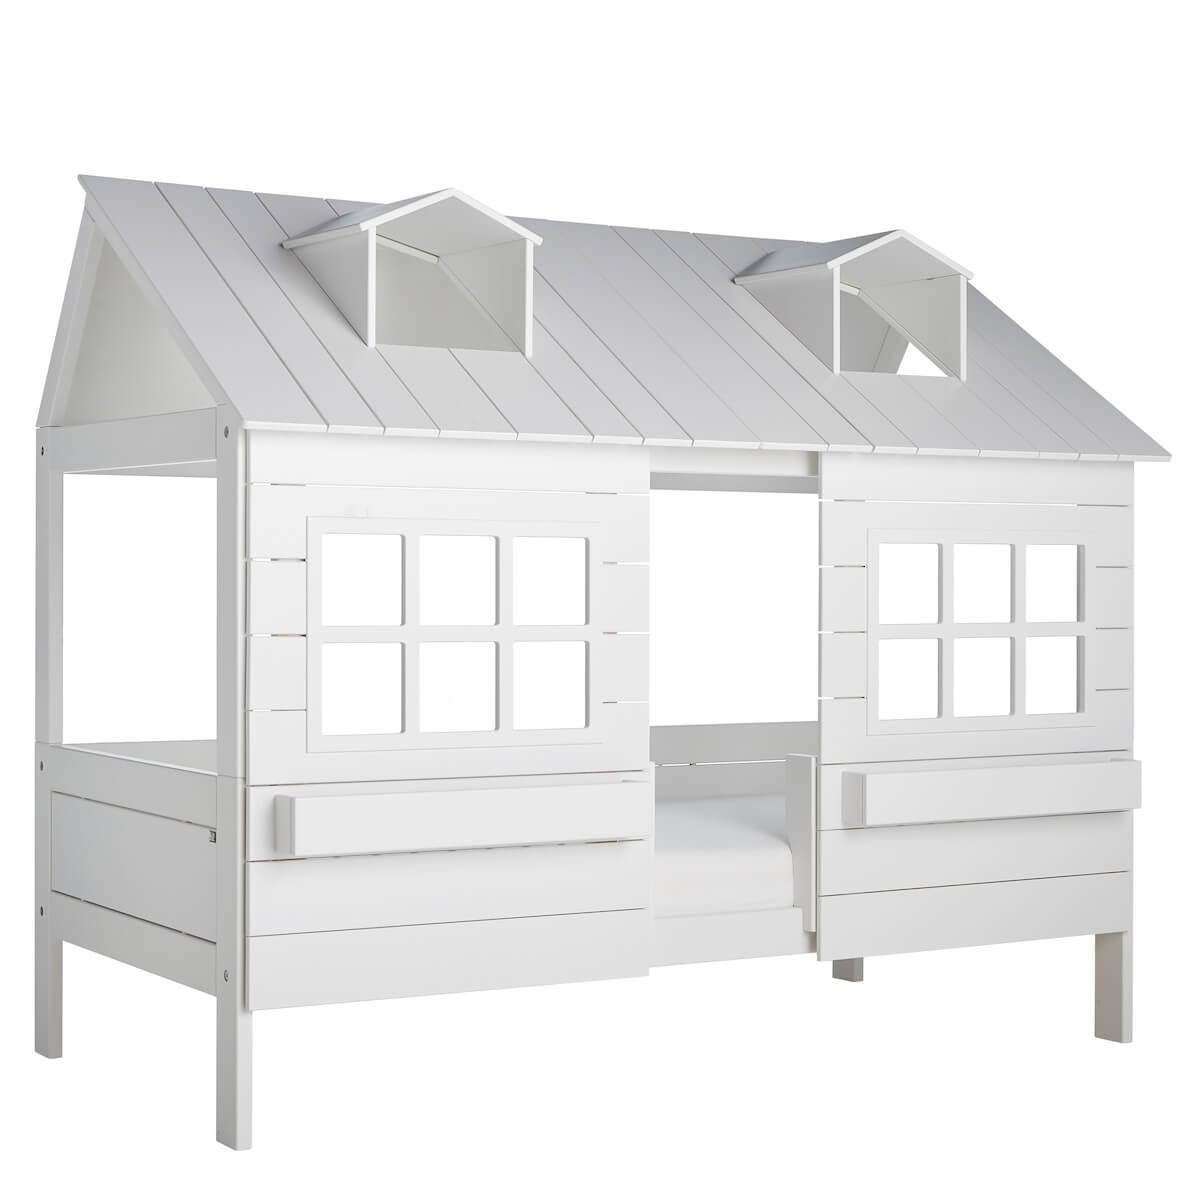 Lit cabane 90x200cm sommier LUXE LAKE HOUSE 1 Lifetime blanc